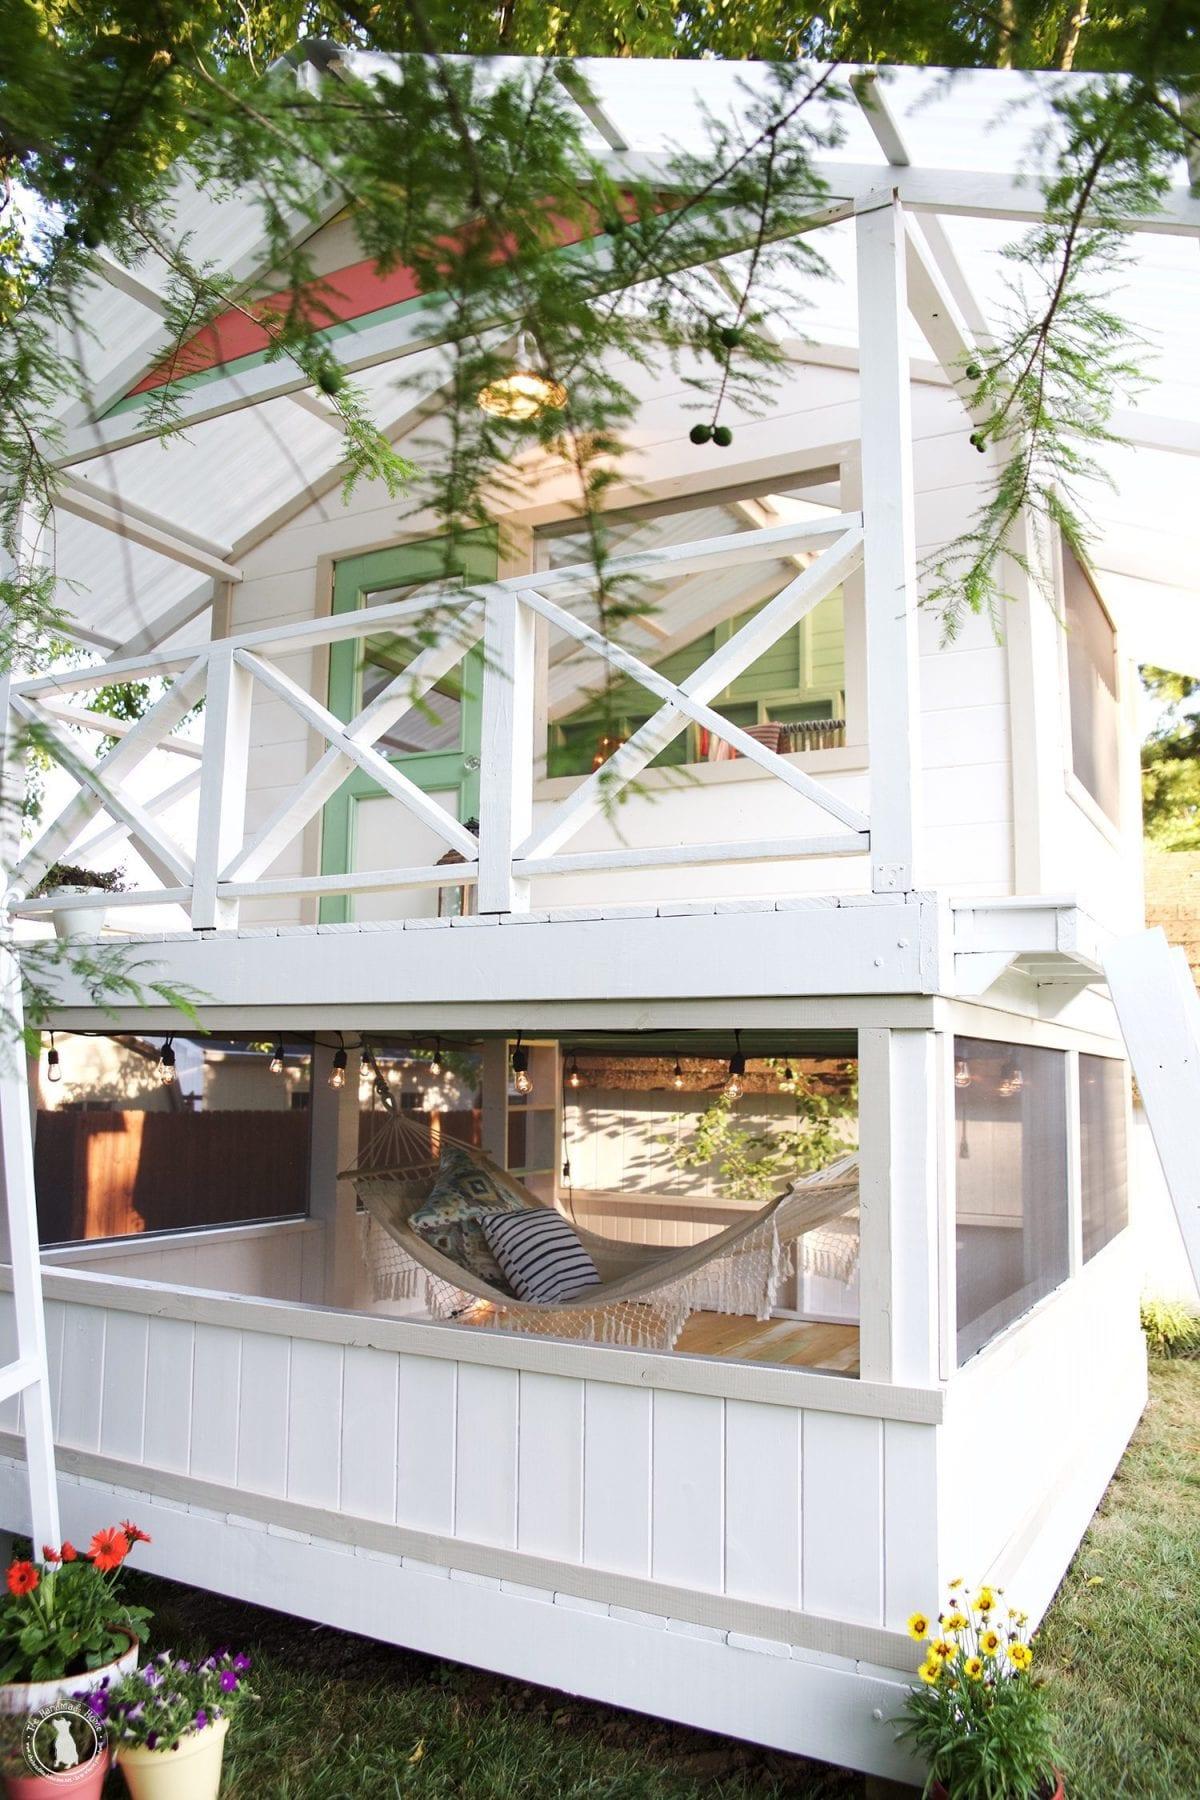 handmade hideaway 2.0 - roof framing and siding - The Handmade Home